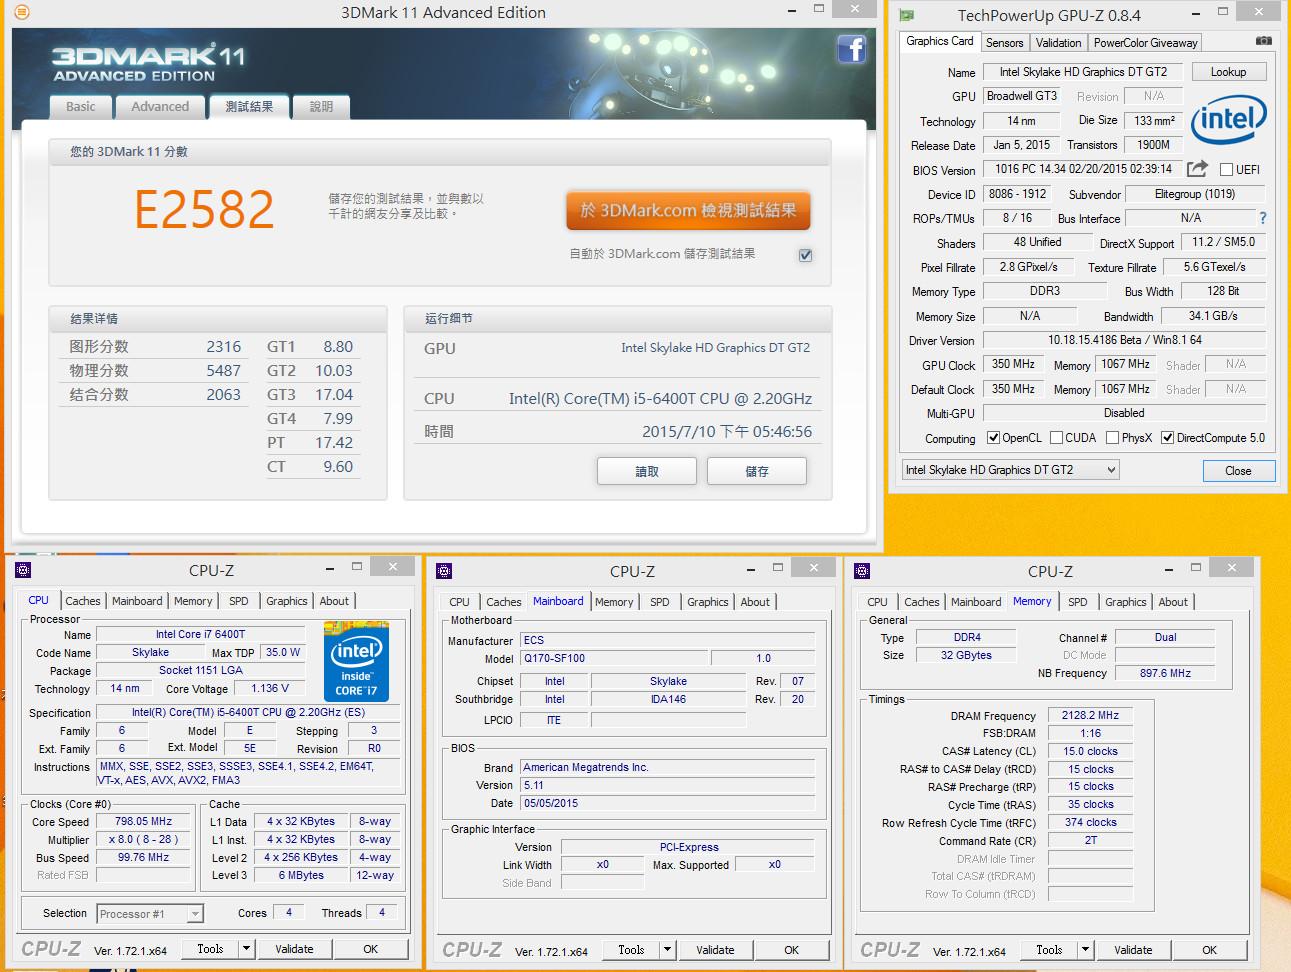 skylake-core-i5-6400t_3dmark-11-entry